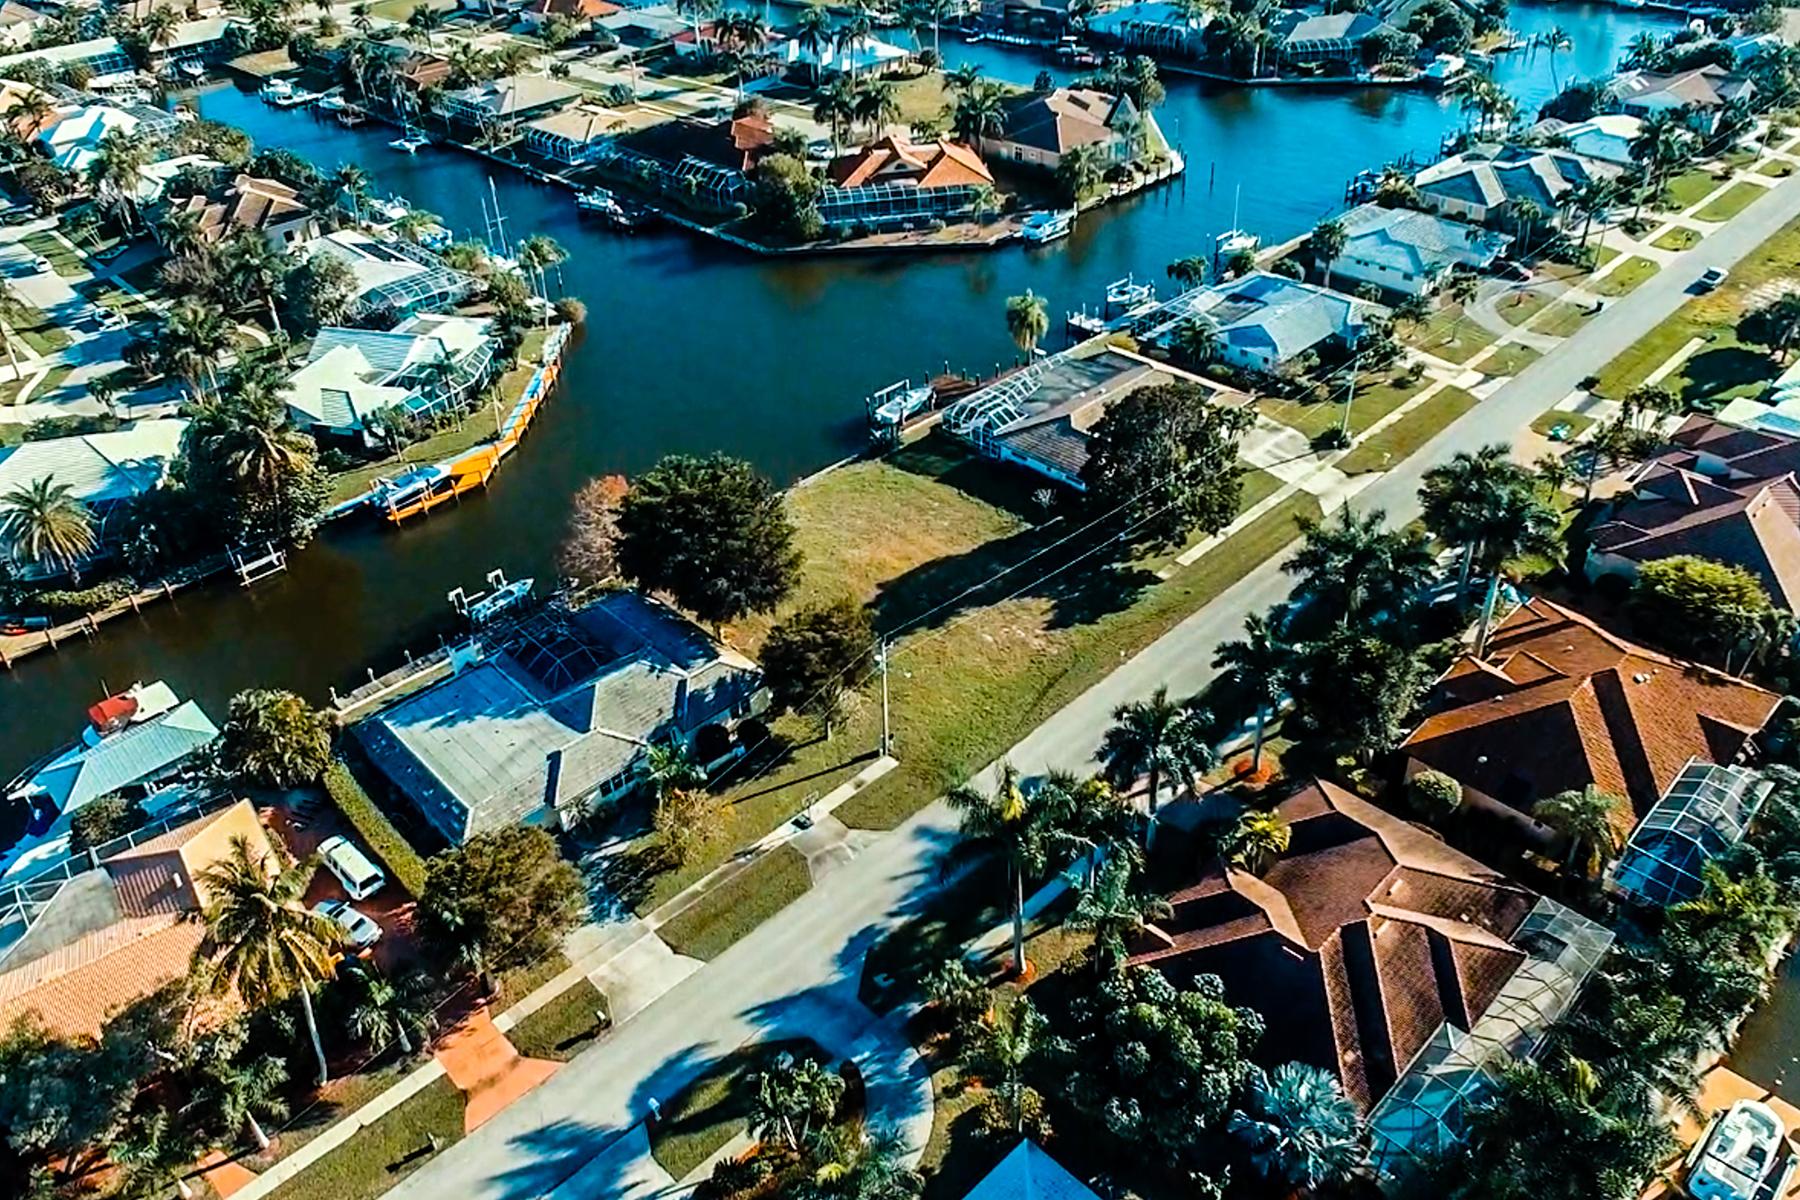 Terreno para Venda às MARCO ISLAND - WAVECREST COURT 1771 Wavecrest Ct Marco Island, Florida, 34145 Estados Unidos